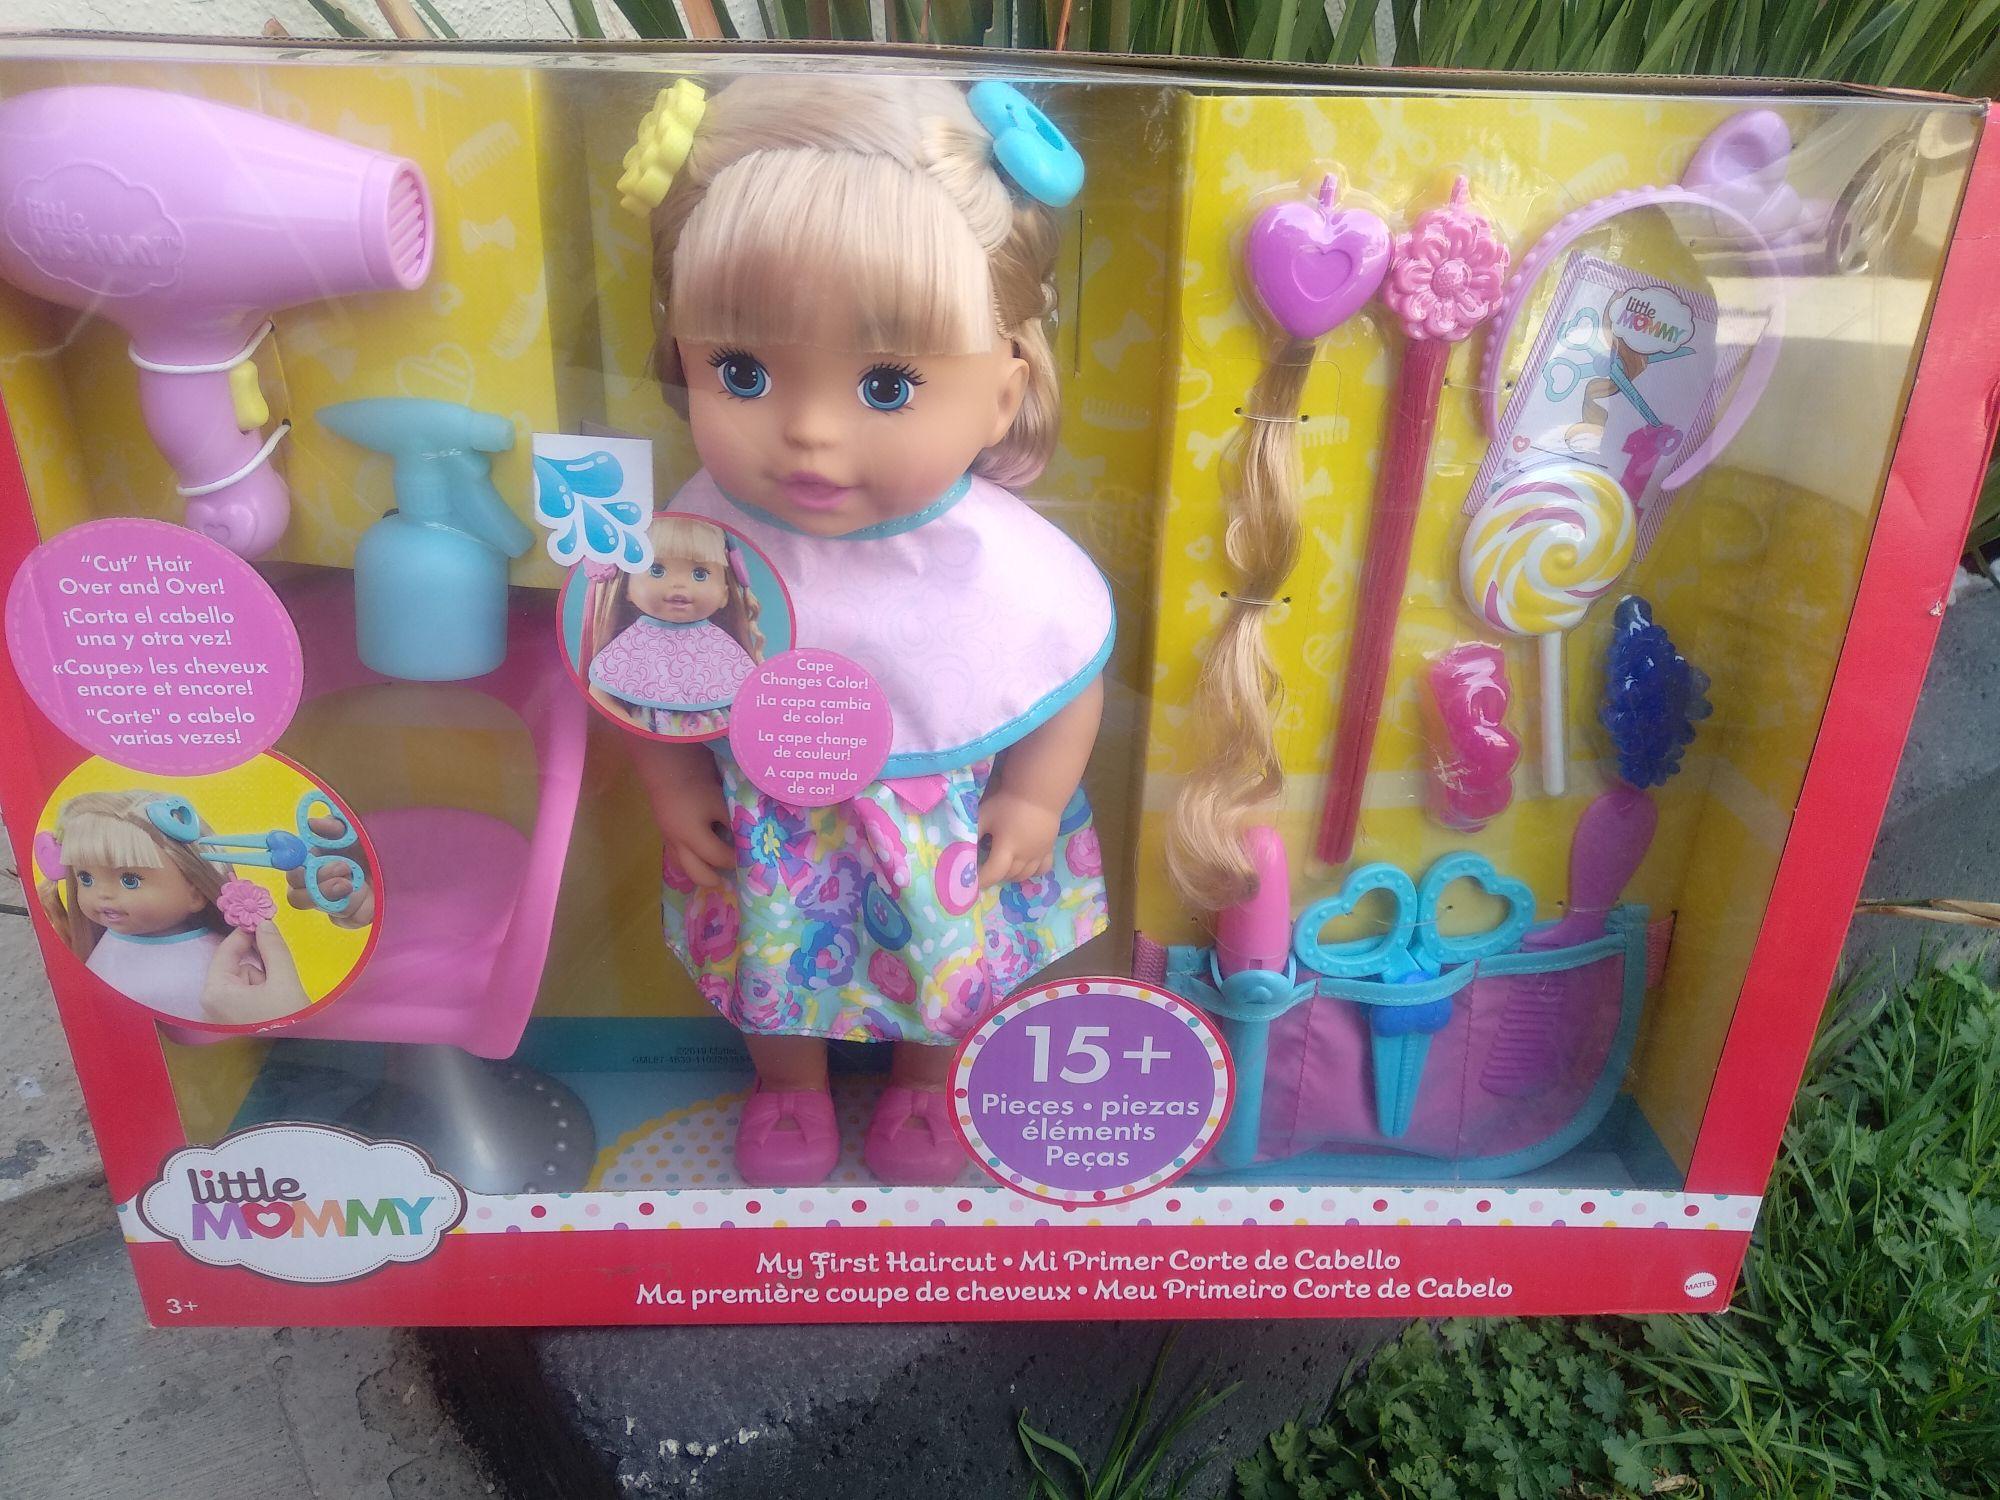 Bodega Aurrera: Little mommy Mi primer corte